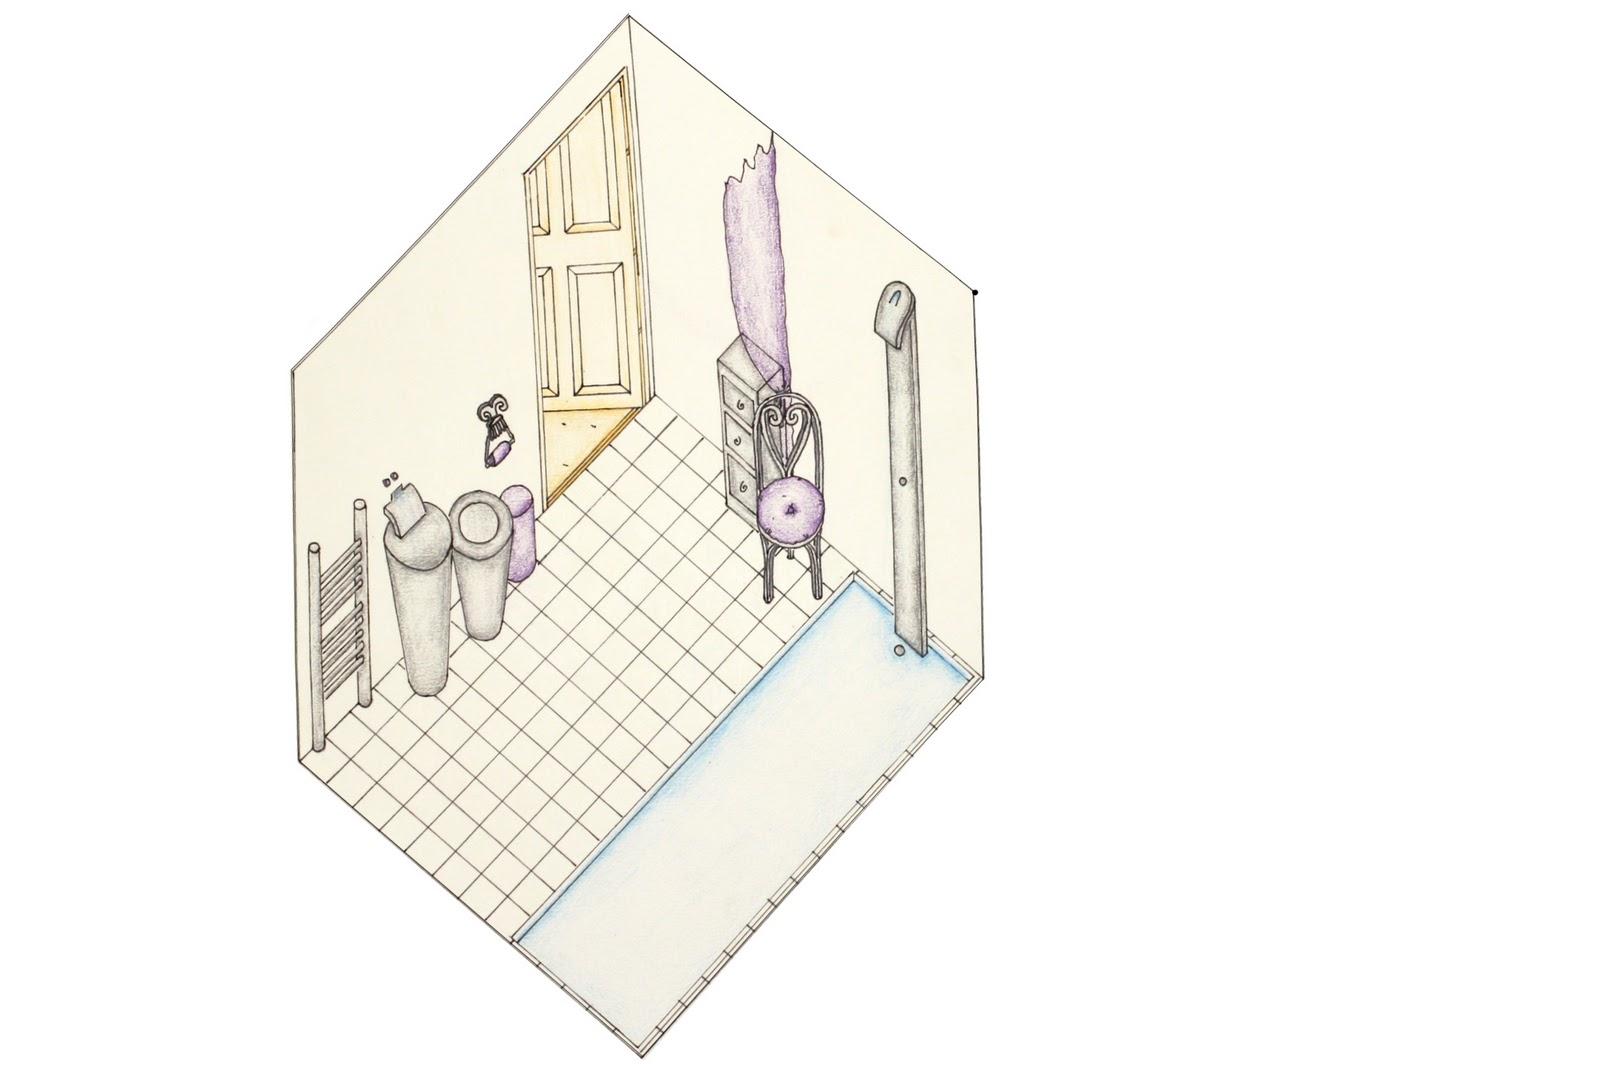 1069951885 Axonometric Bathroom Drawing